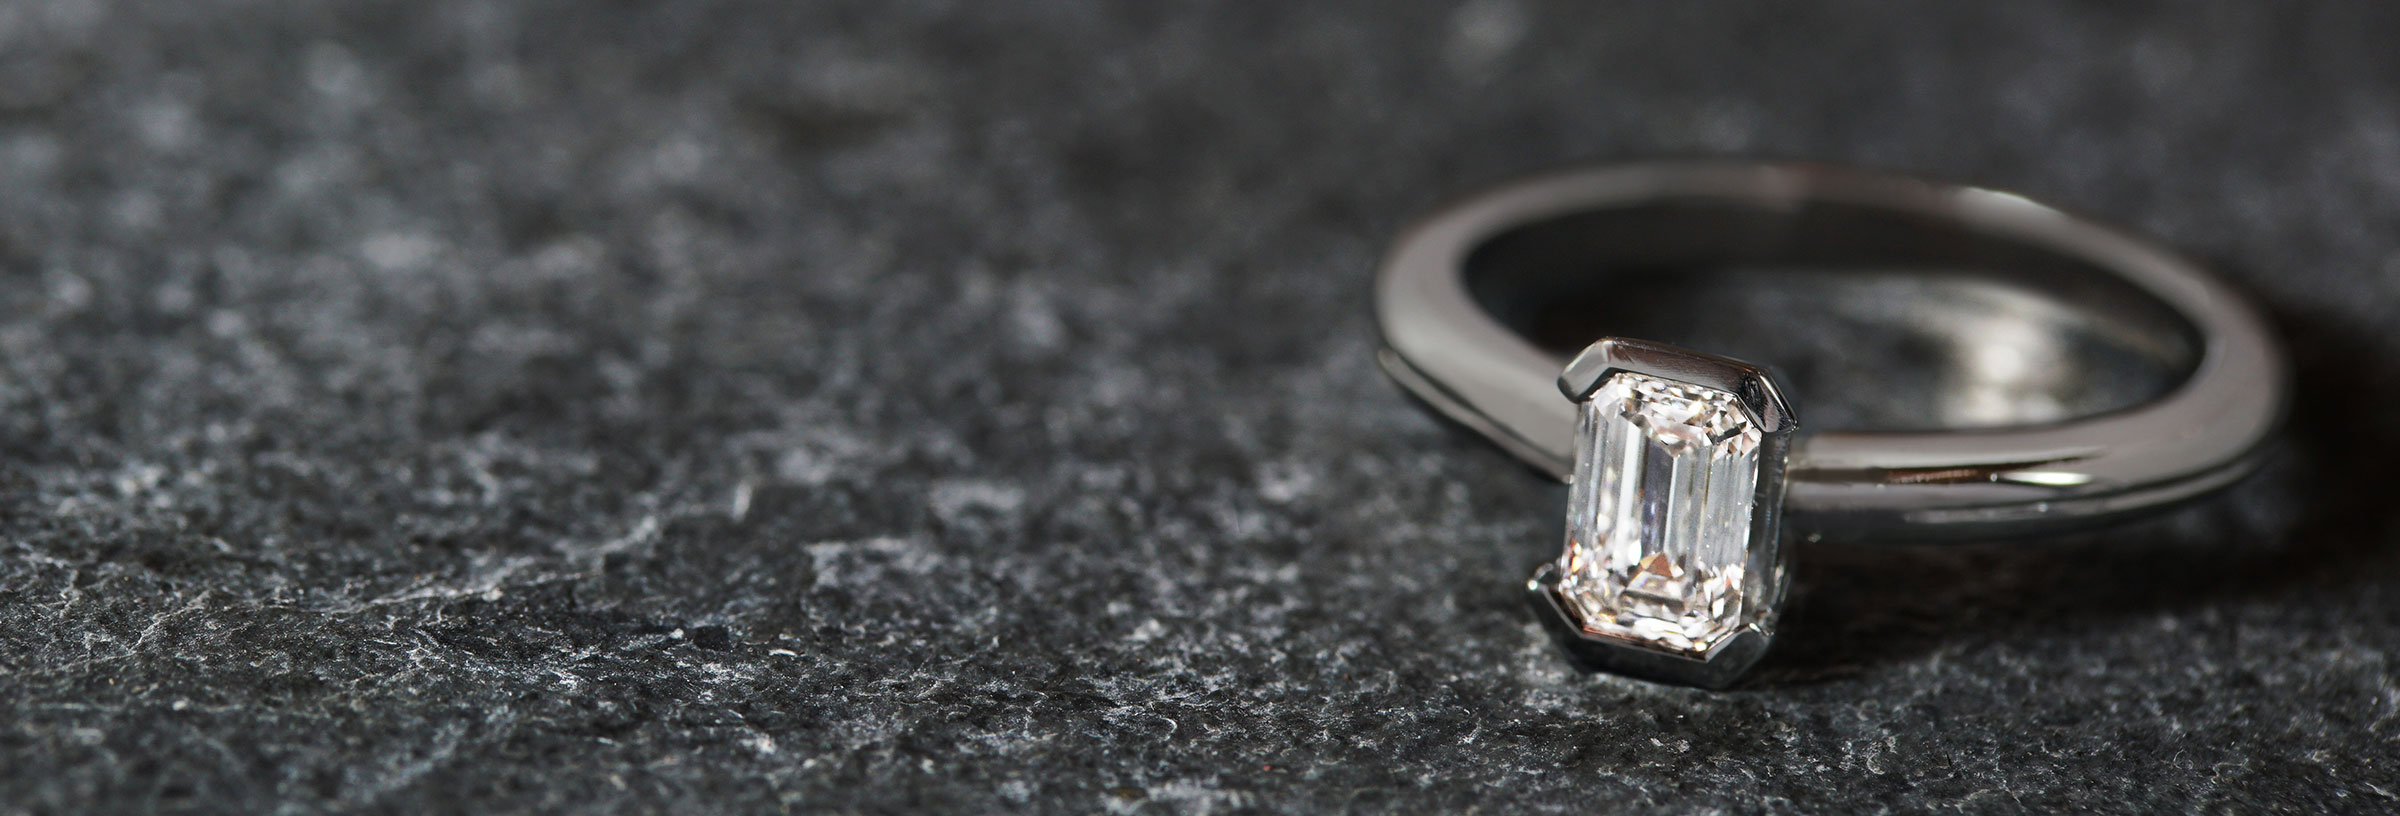 platinum-and-emerald-cut-diamond-engagement-ring